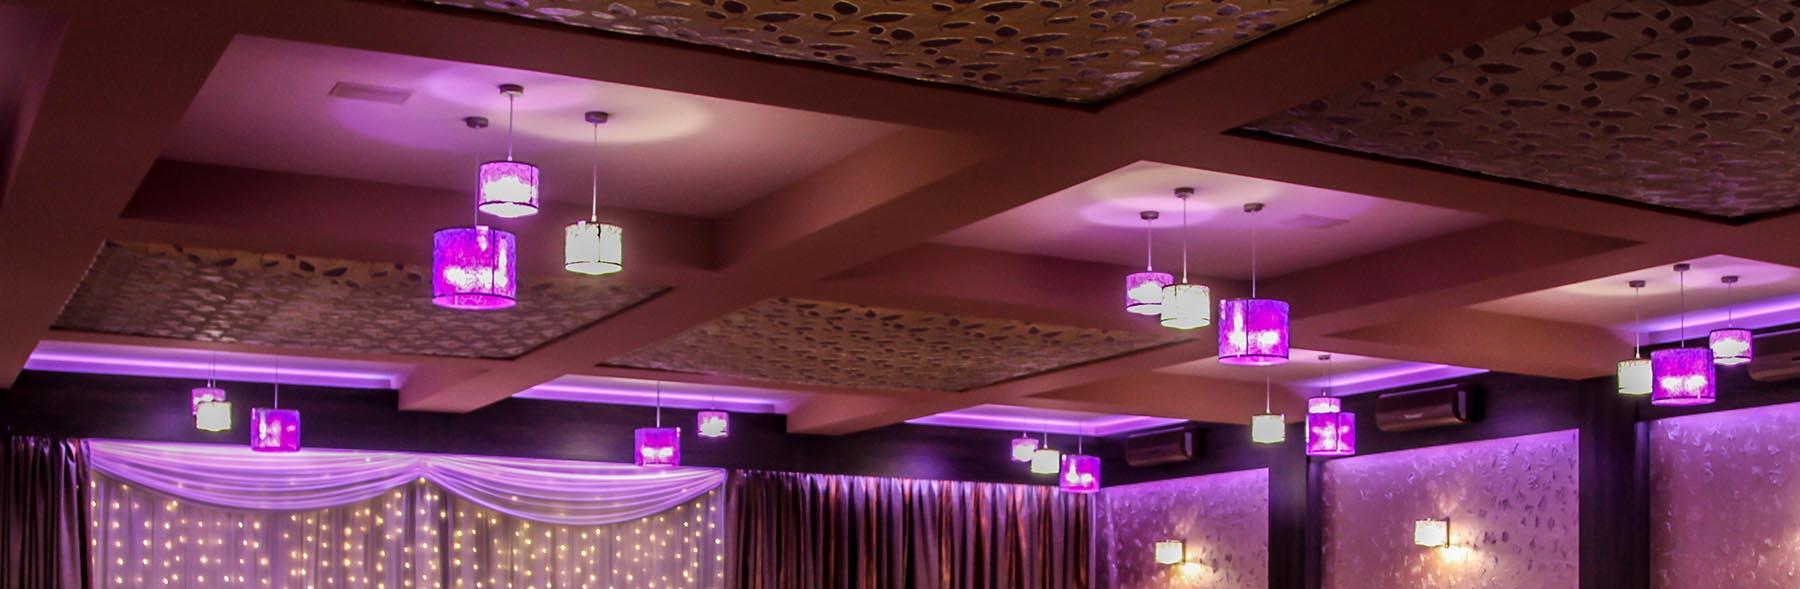 Park Hotel Gyula Philips Hue LED világítás